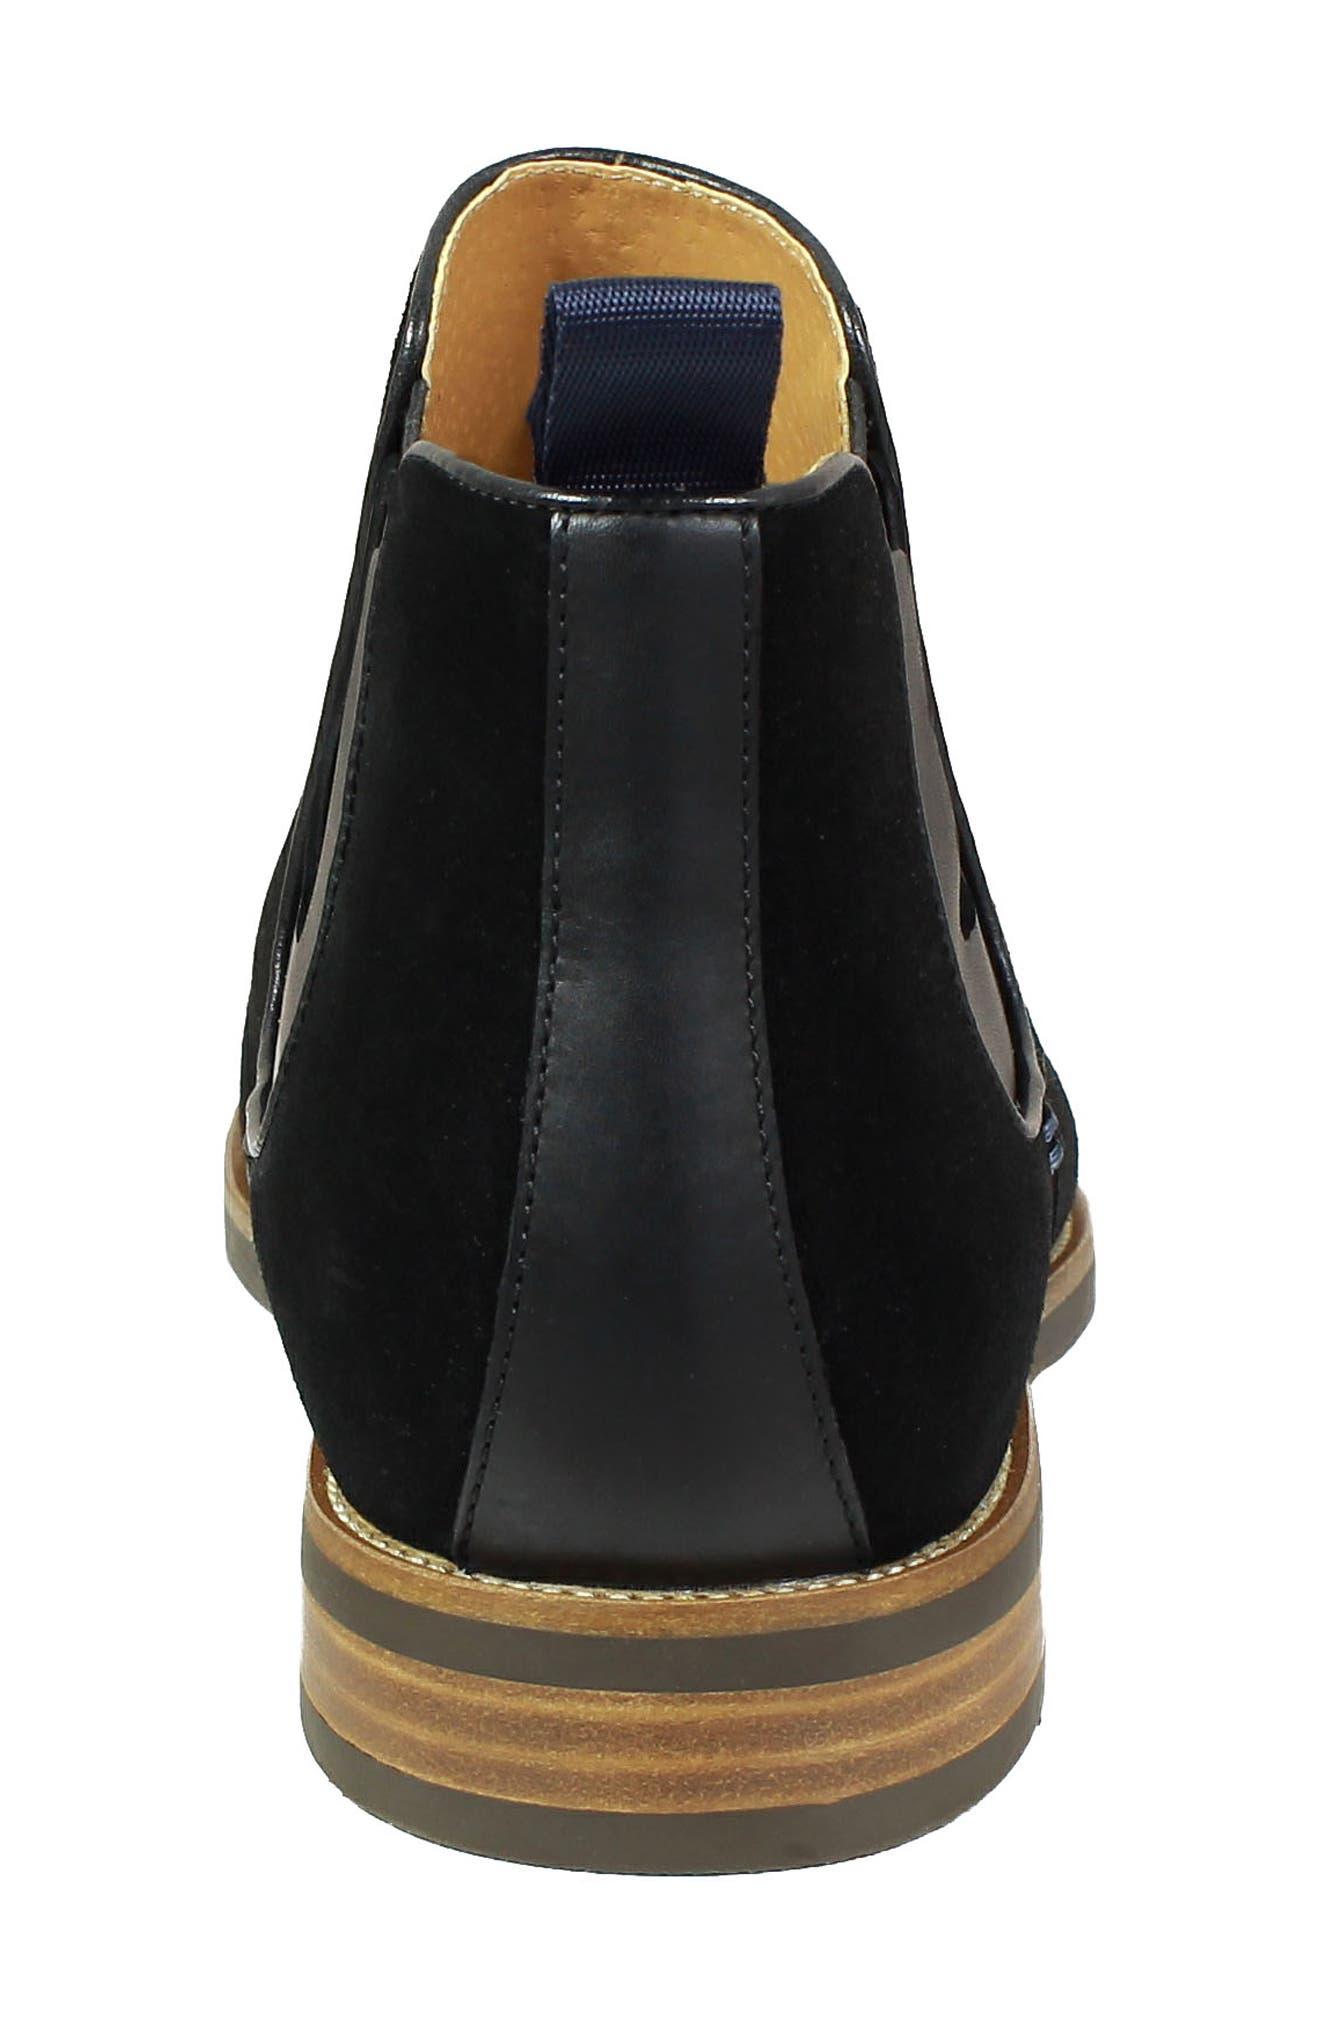 Uptown Plain Toe Mid Chelsea Boot,                             Alternate thumbnail 7, color,                             BLACK SUEDE